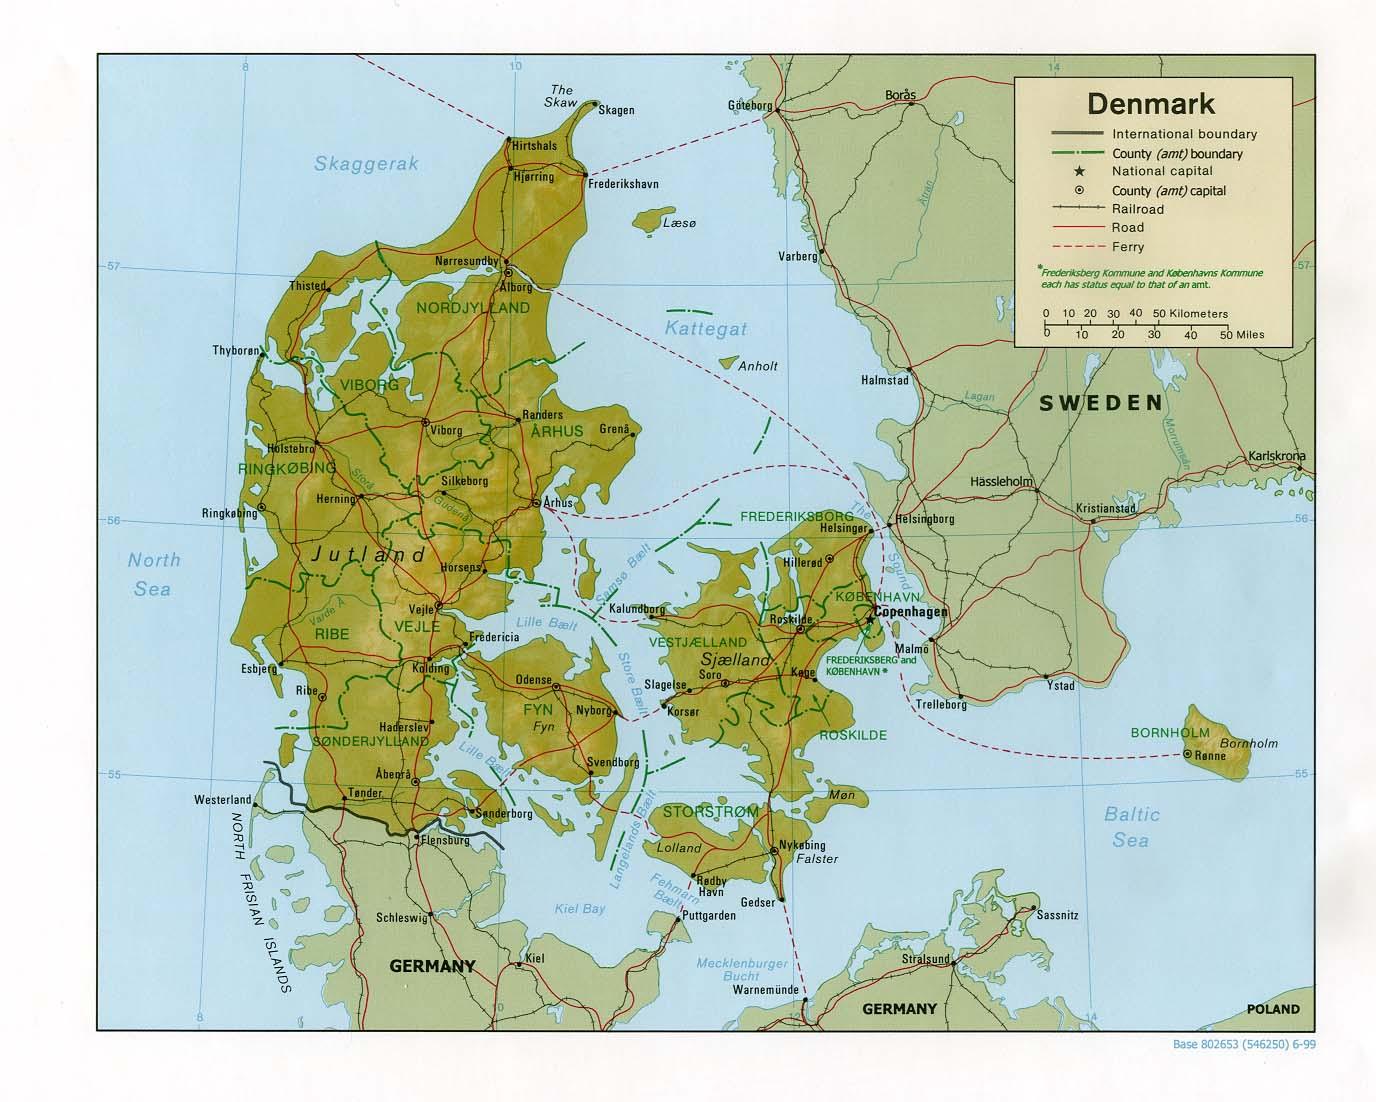 Map of Denmark (Relief Map) : Weltkarte.com - Karten und Stadtpläne ...